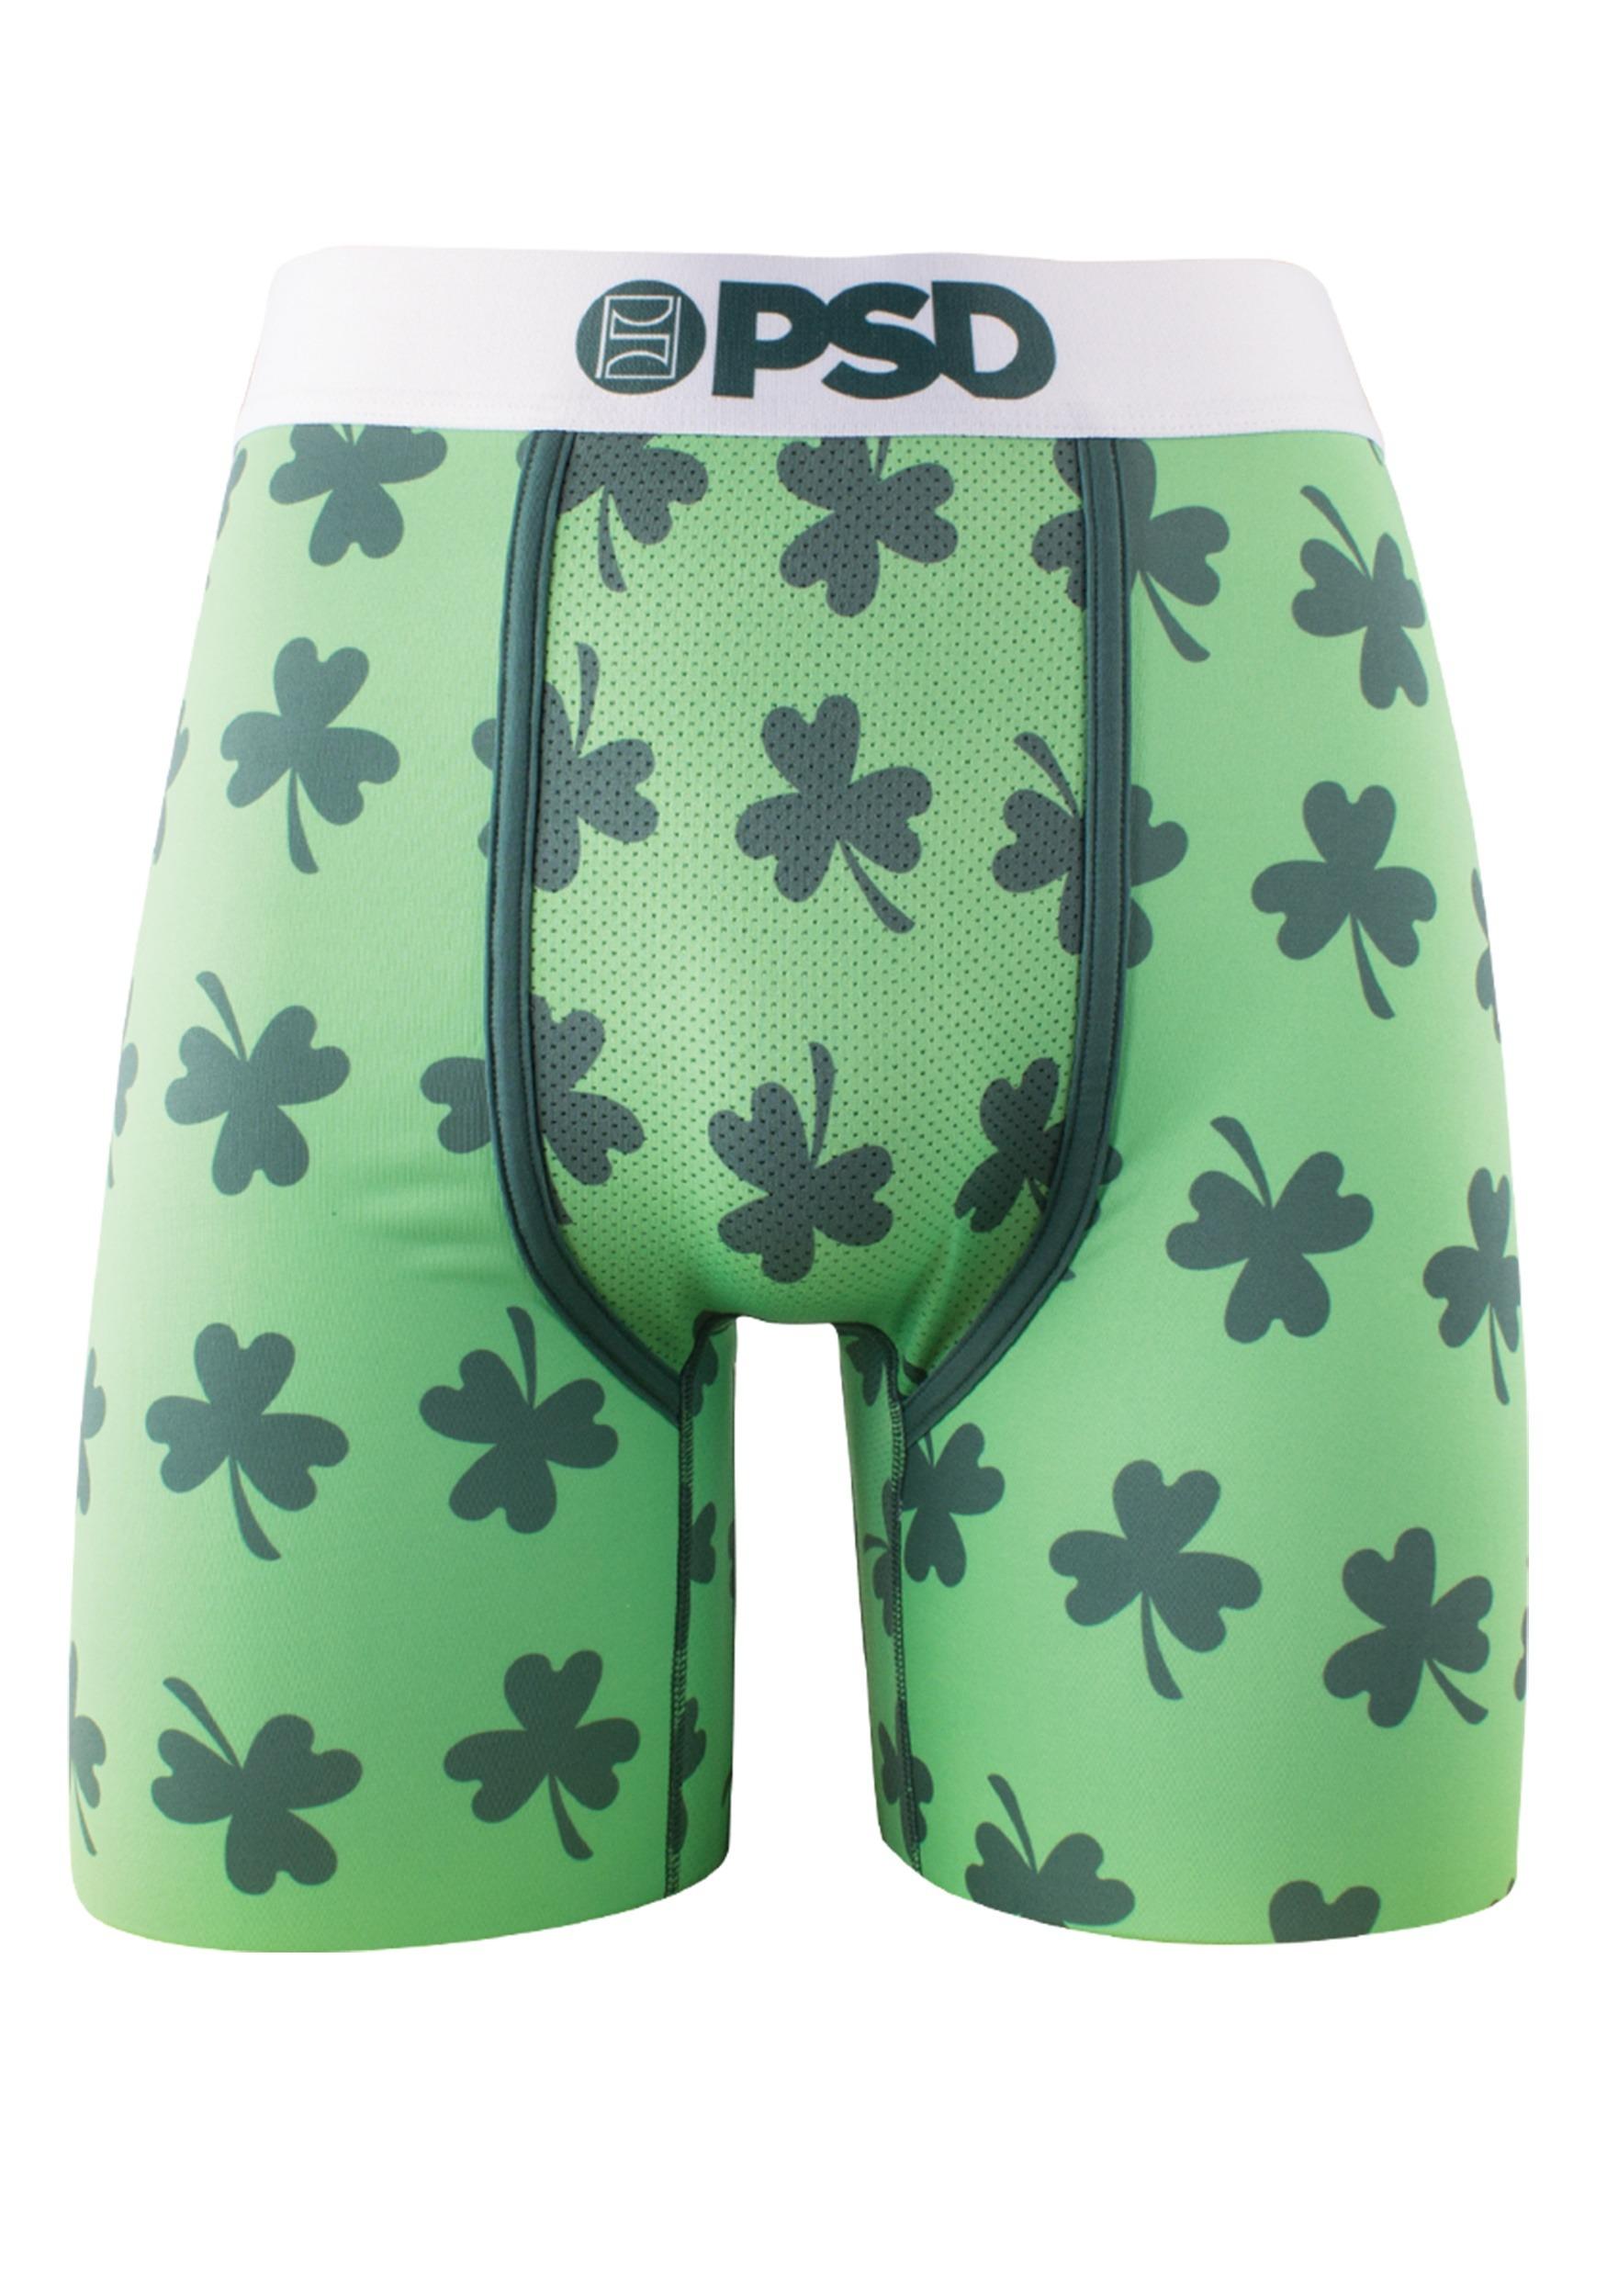 Lucky Clover PSD Underwear Kyrie Irving